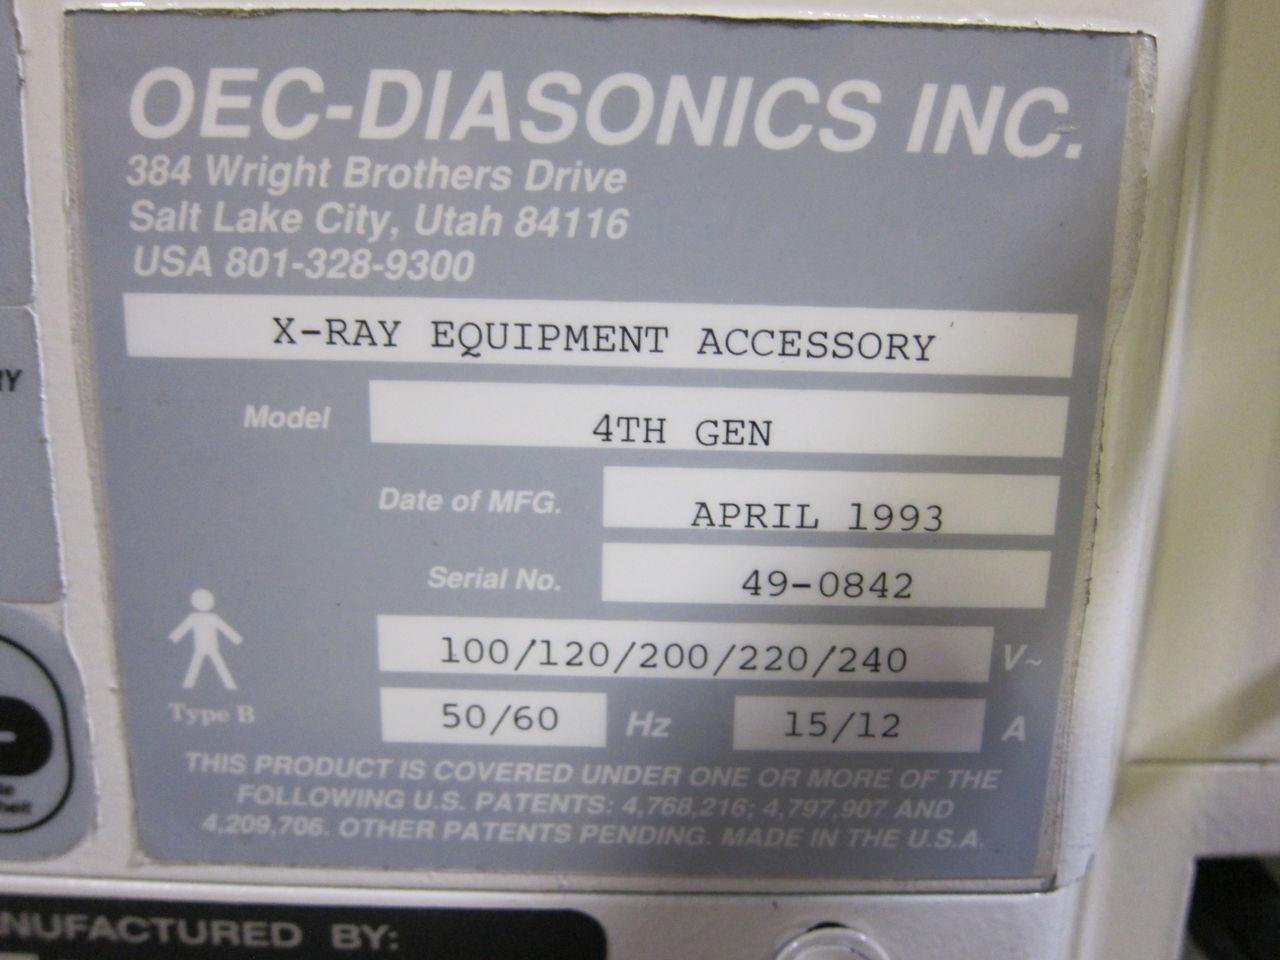 OEC - DIASONICS 9400 Series C-Arm